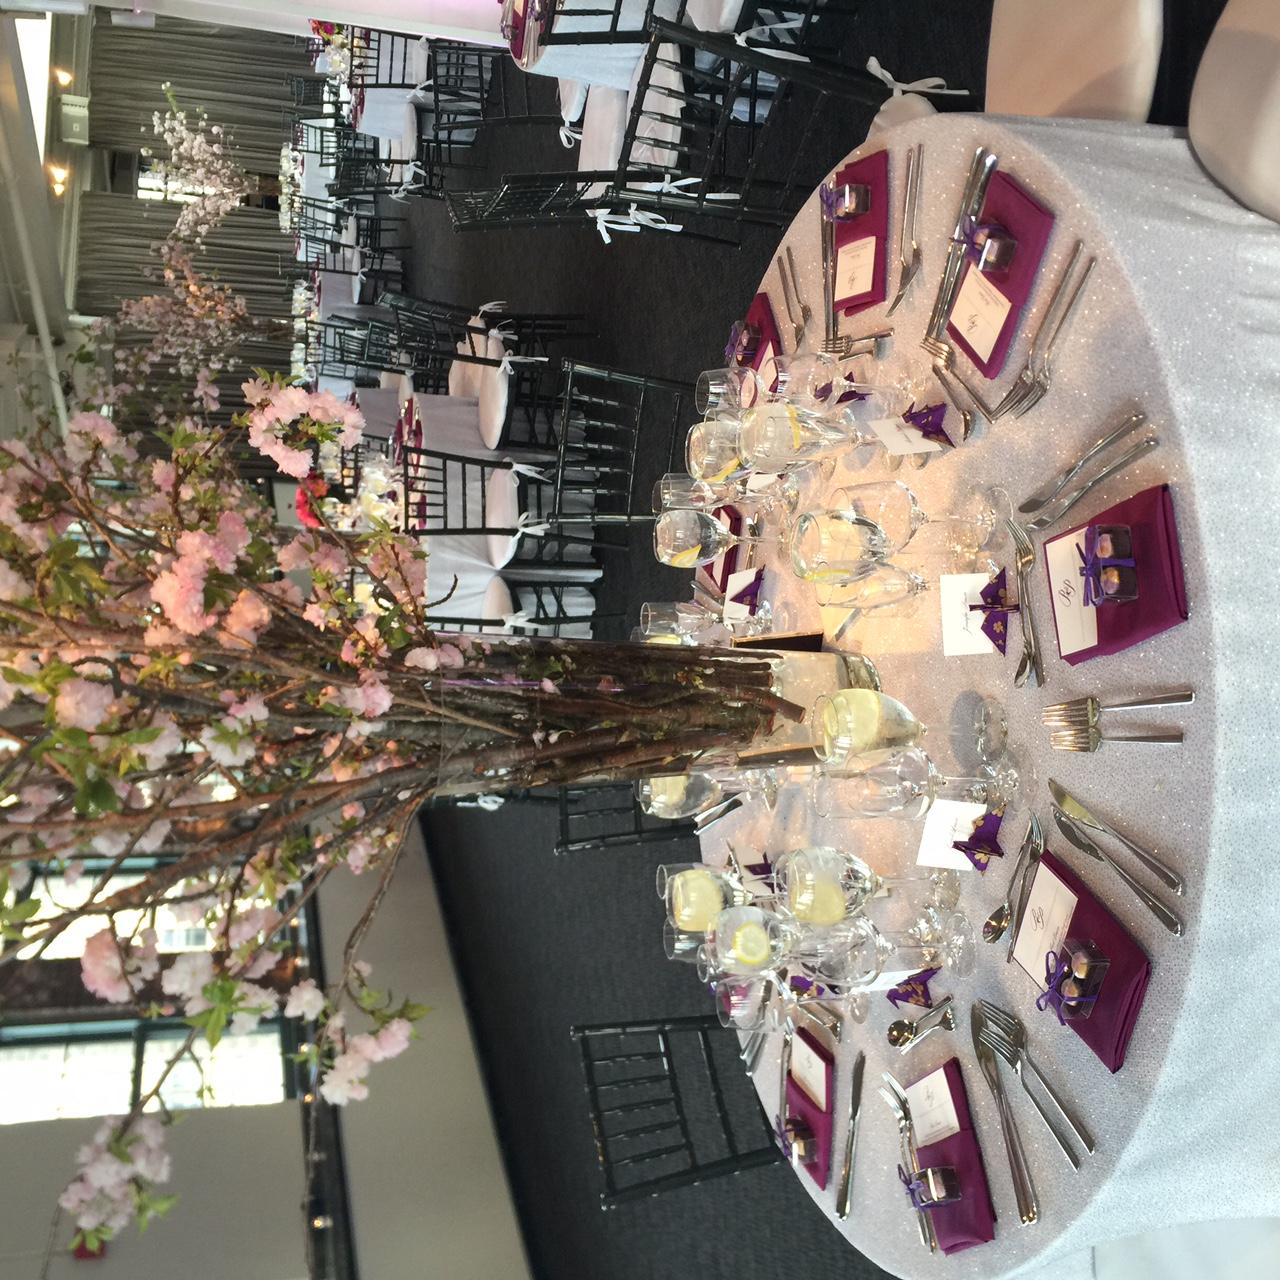 Scenic Wedding at Tribeca Rooftop in New York - Kleifield Design & Associates, Inc.